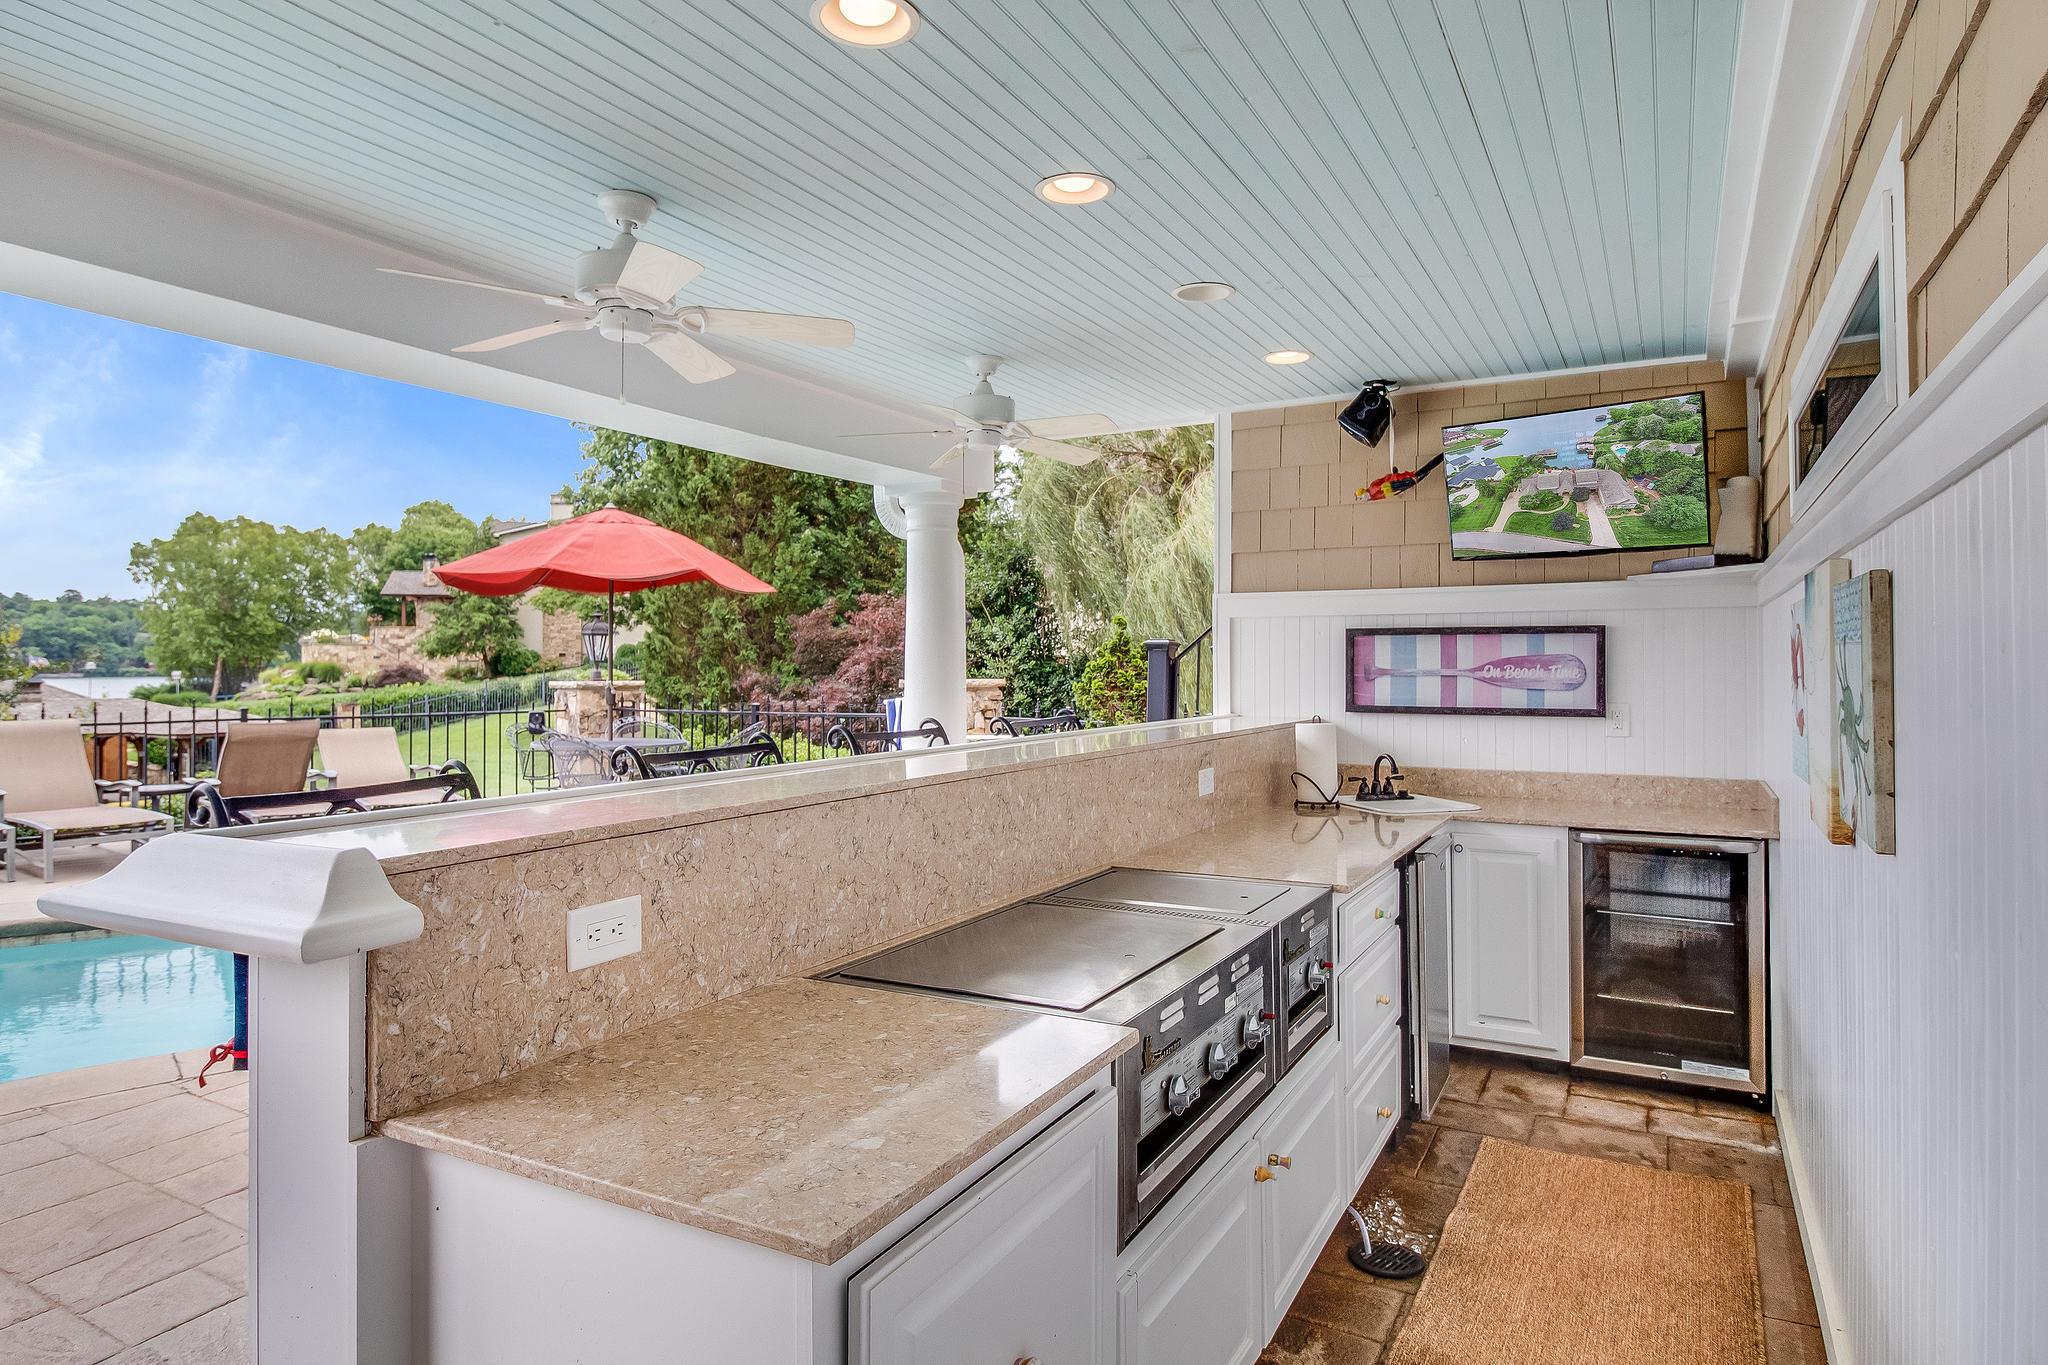 Poolside Bar/Outdoor Kitchen